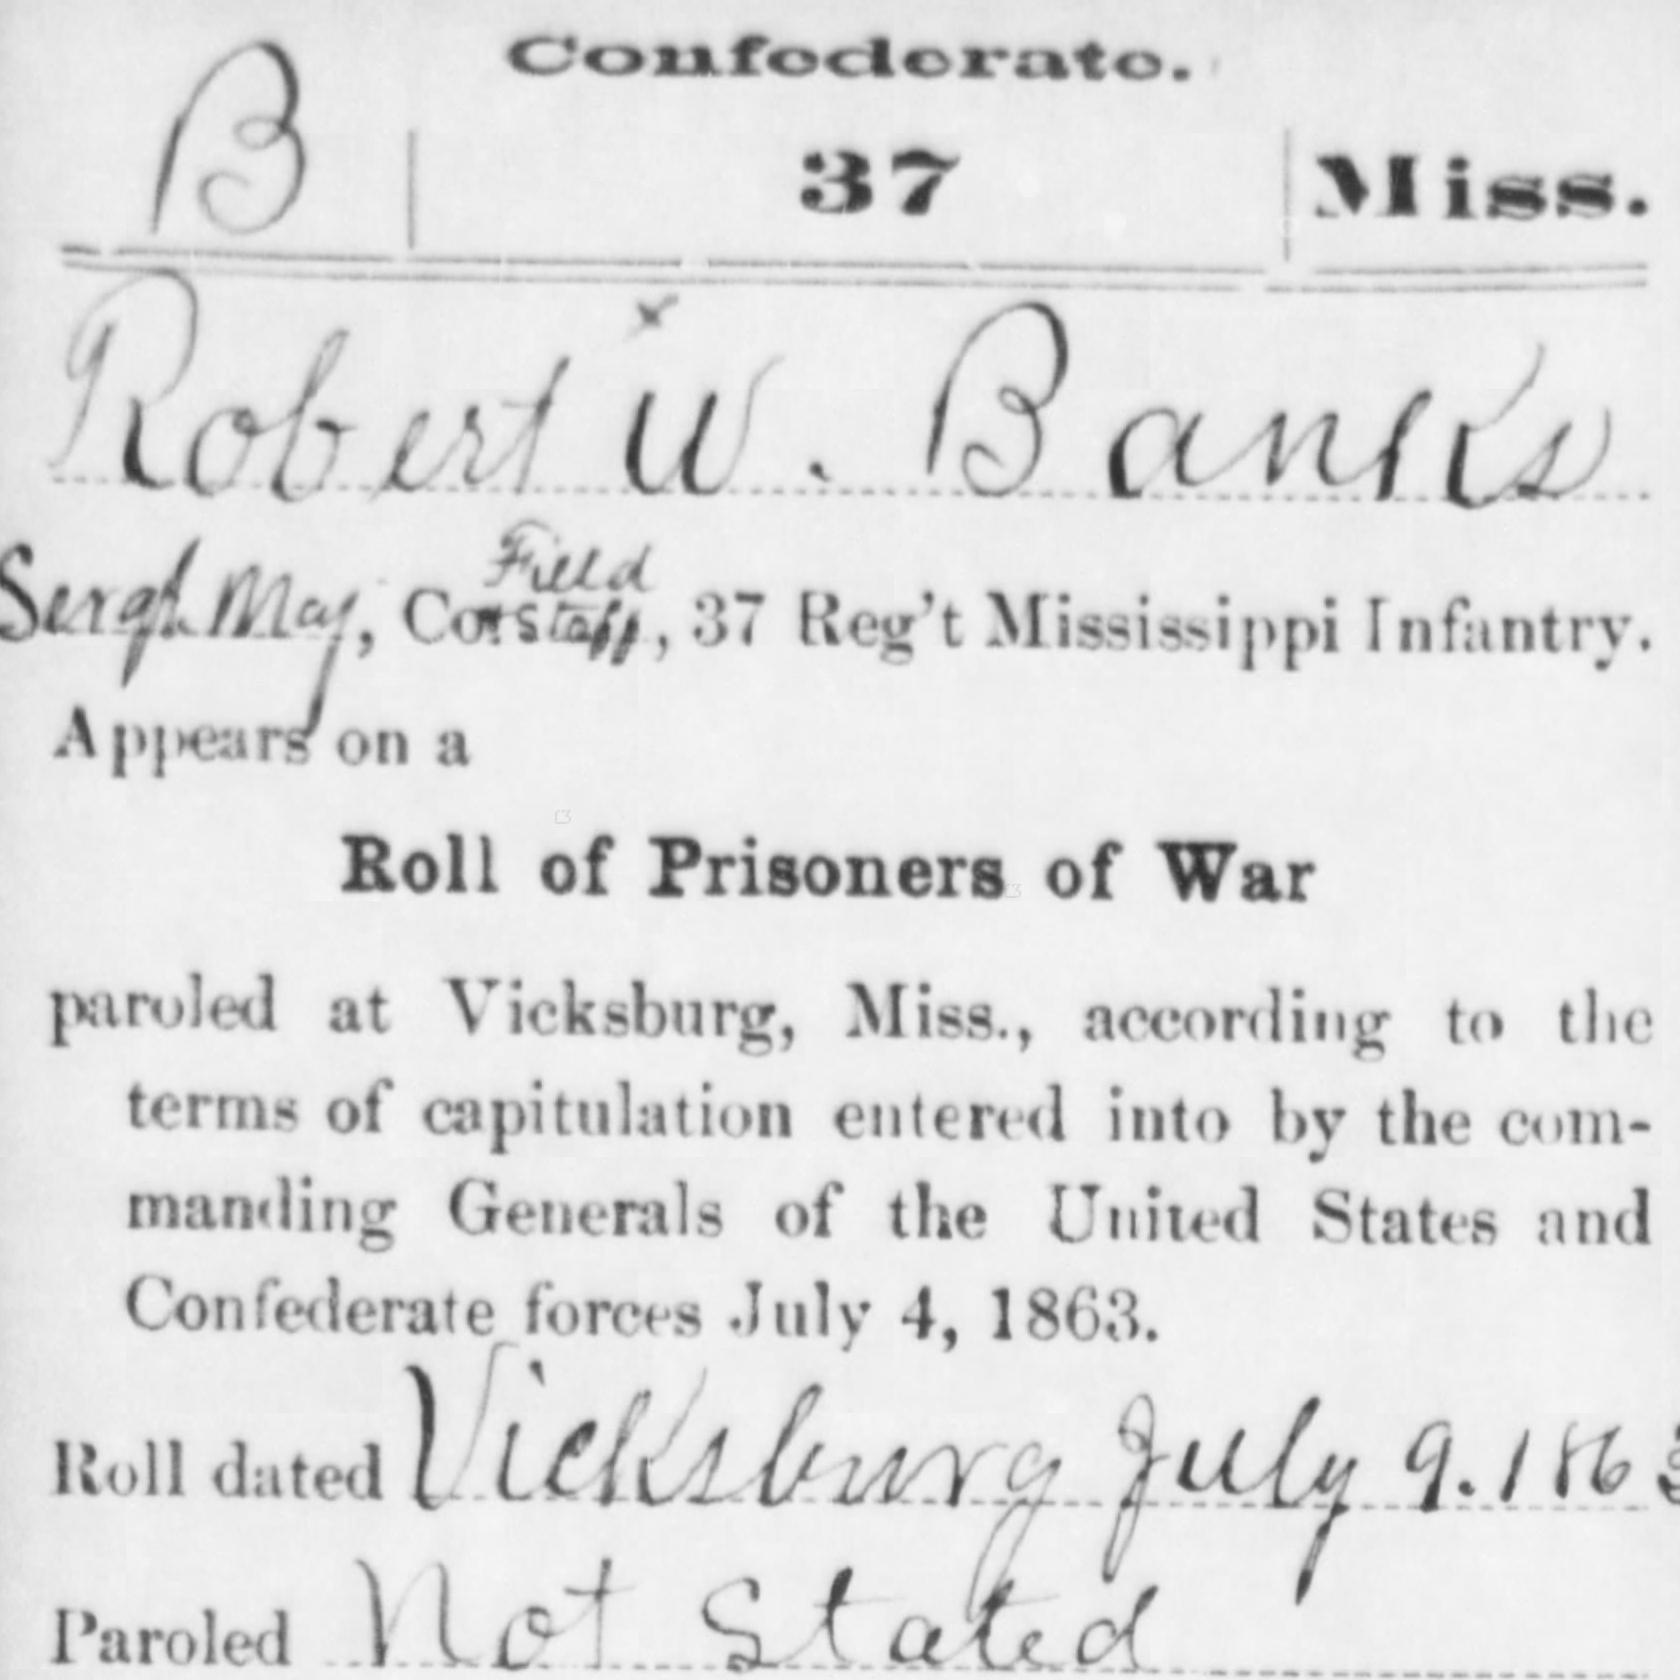 Capt. Robert Banks, Co. D, 37th MS Infantry, CSA